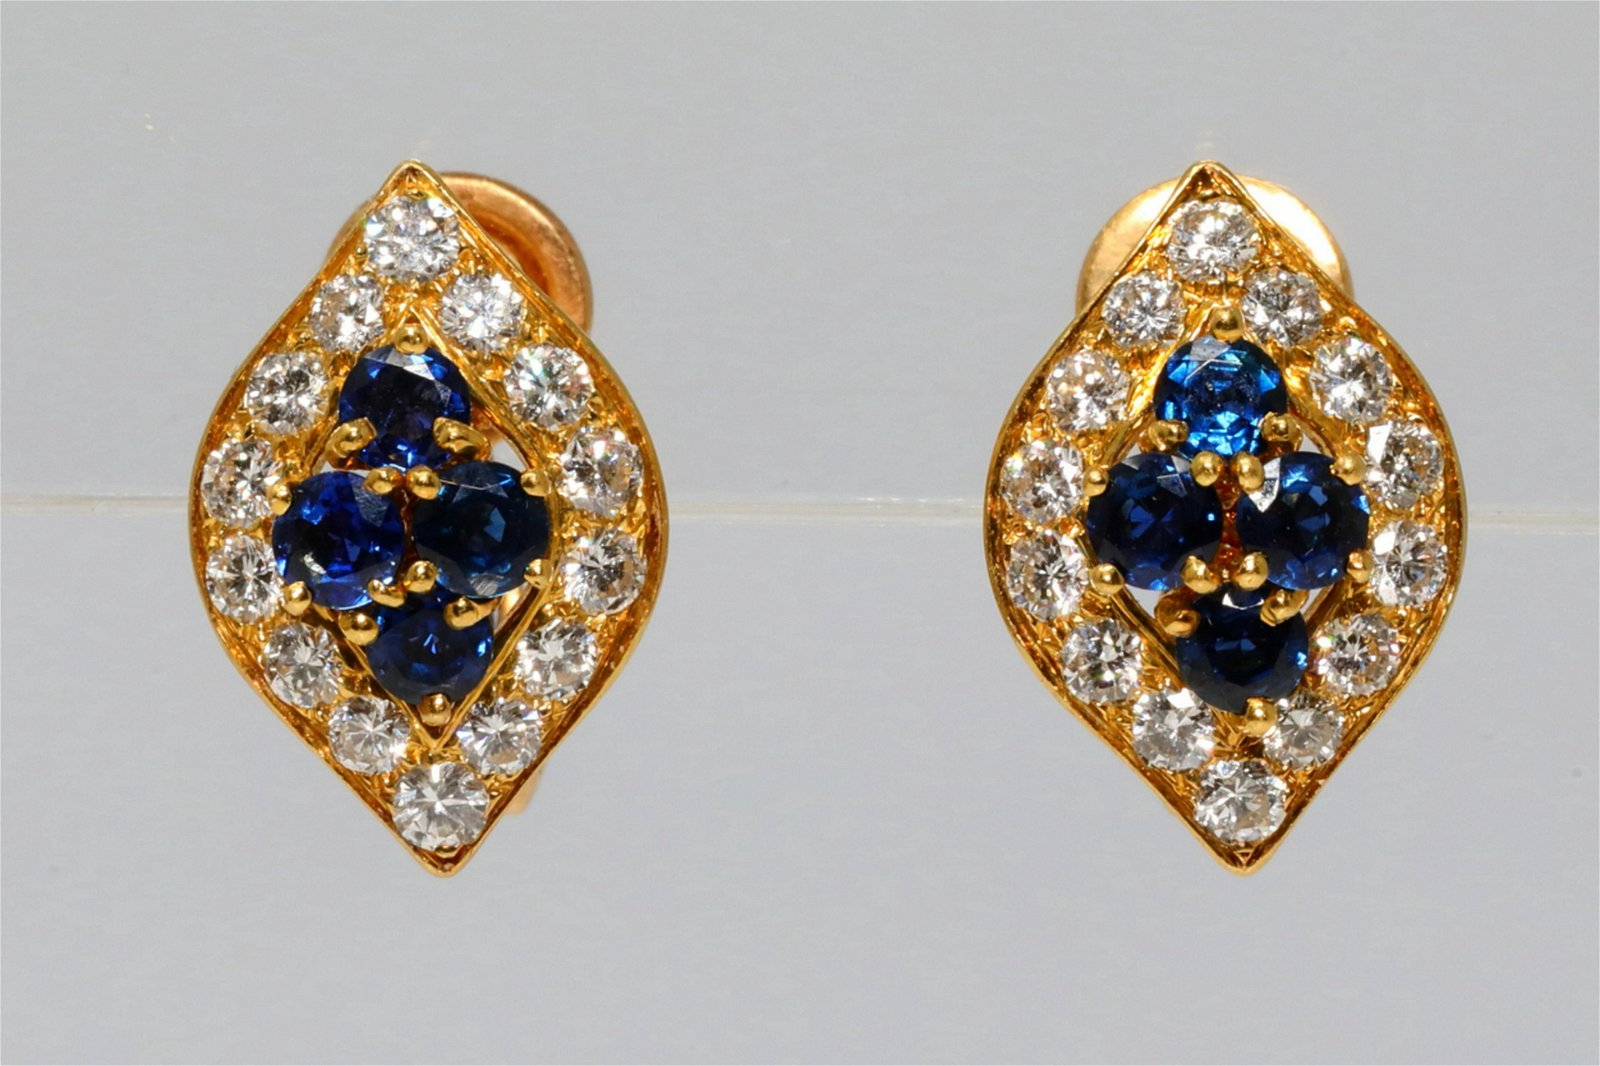 Van Cleef & Arpels 0.75ctw Diamond 18K Ear Clips